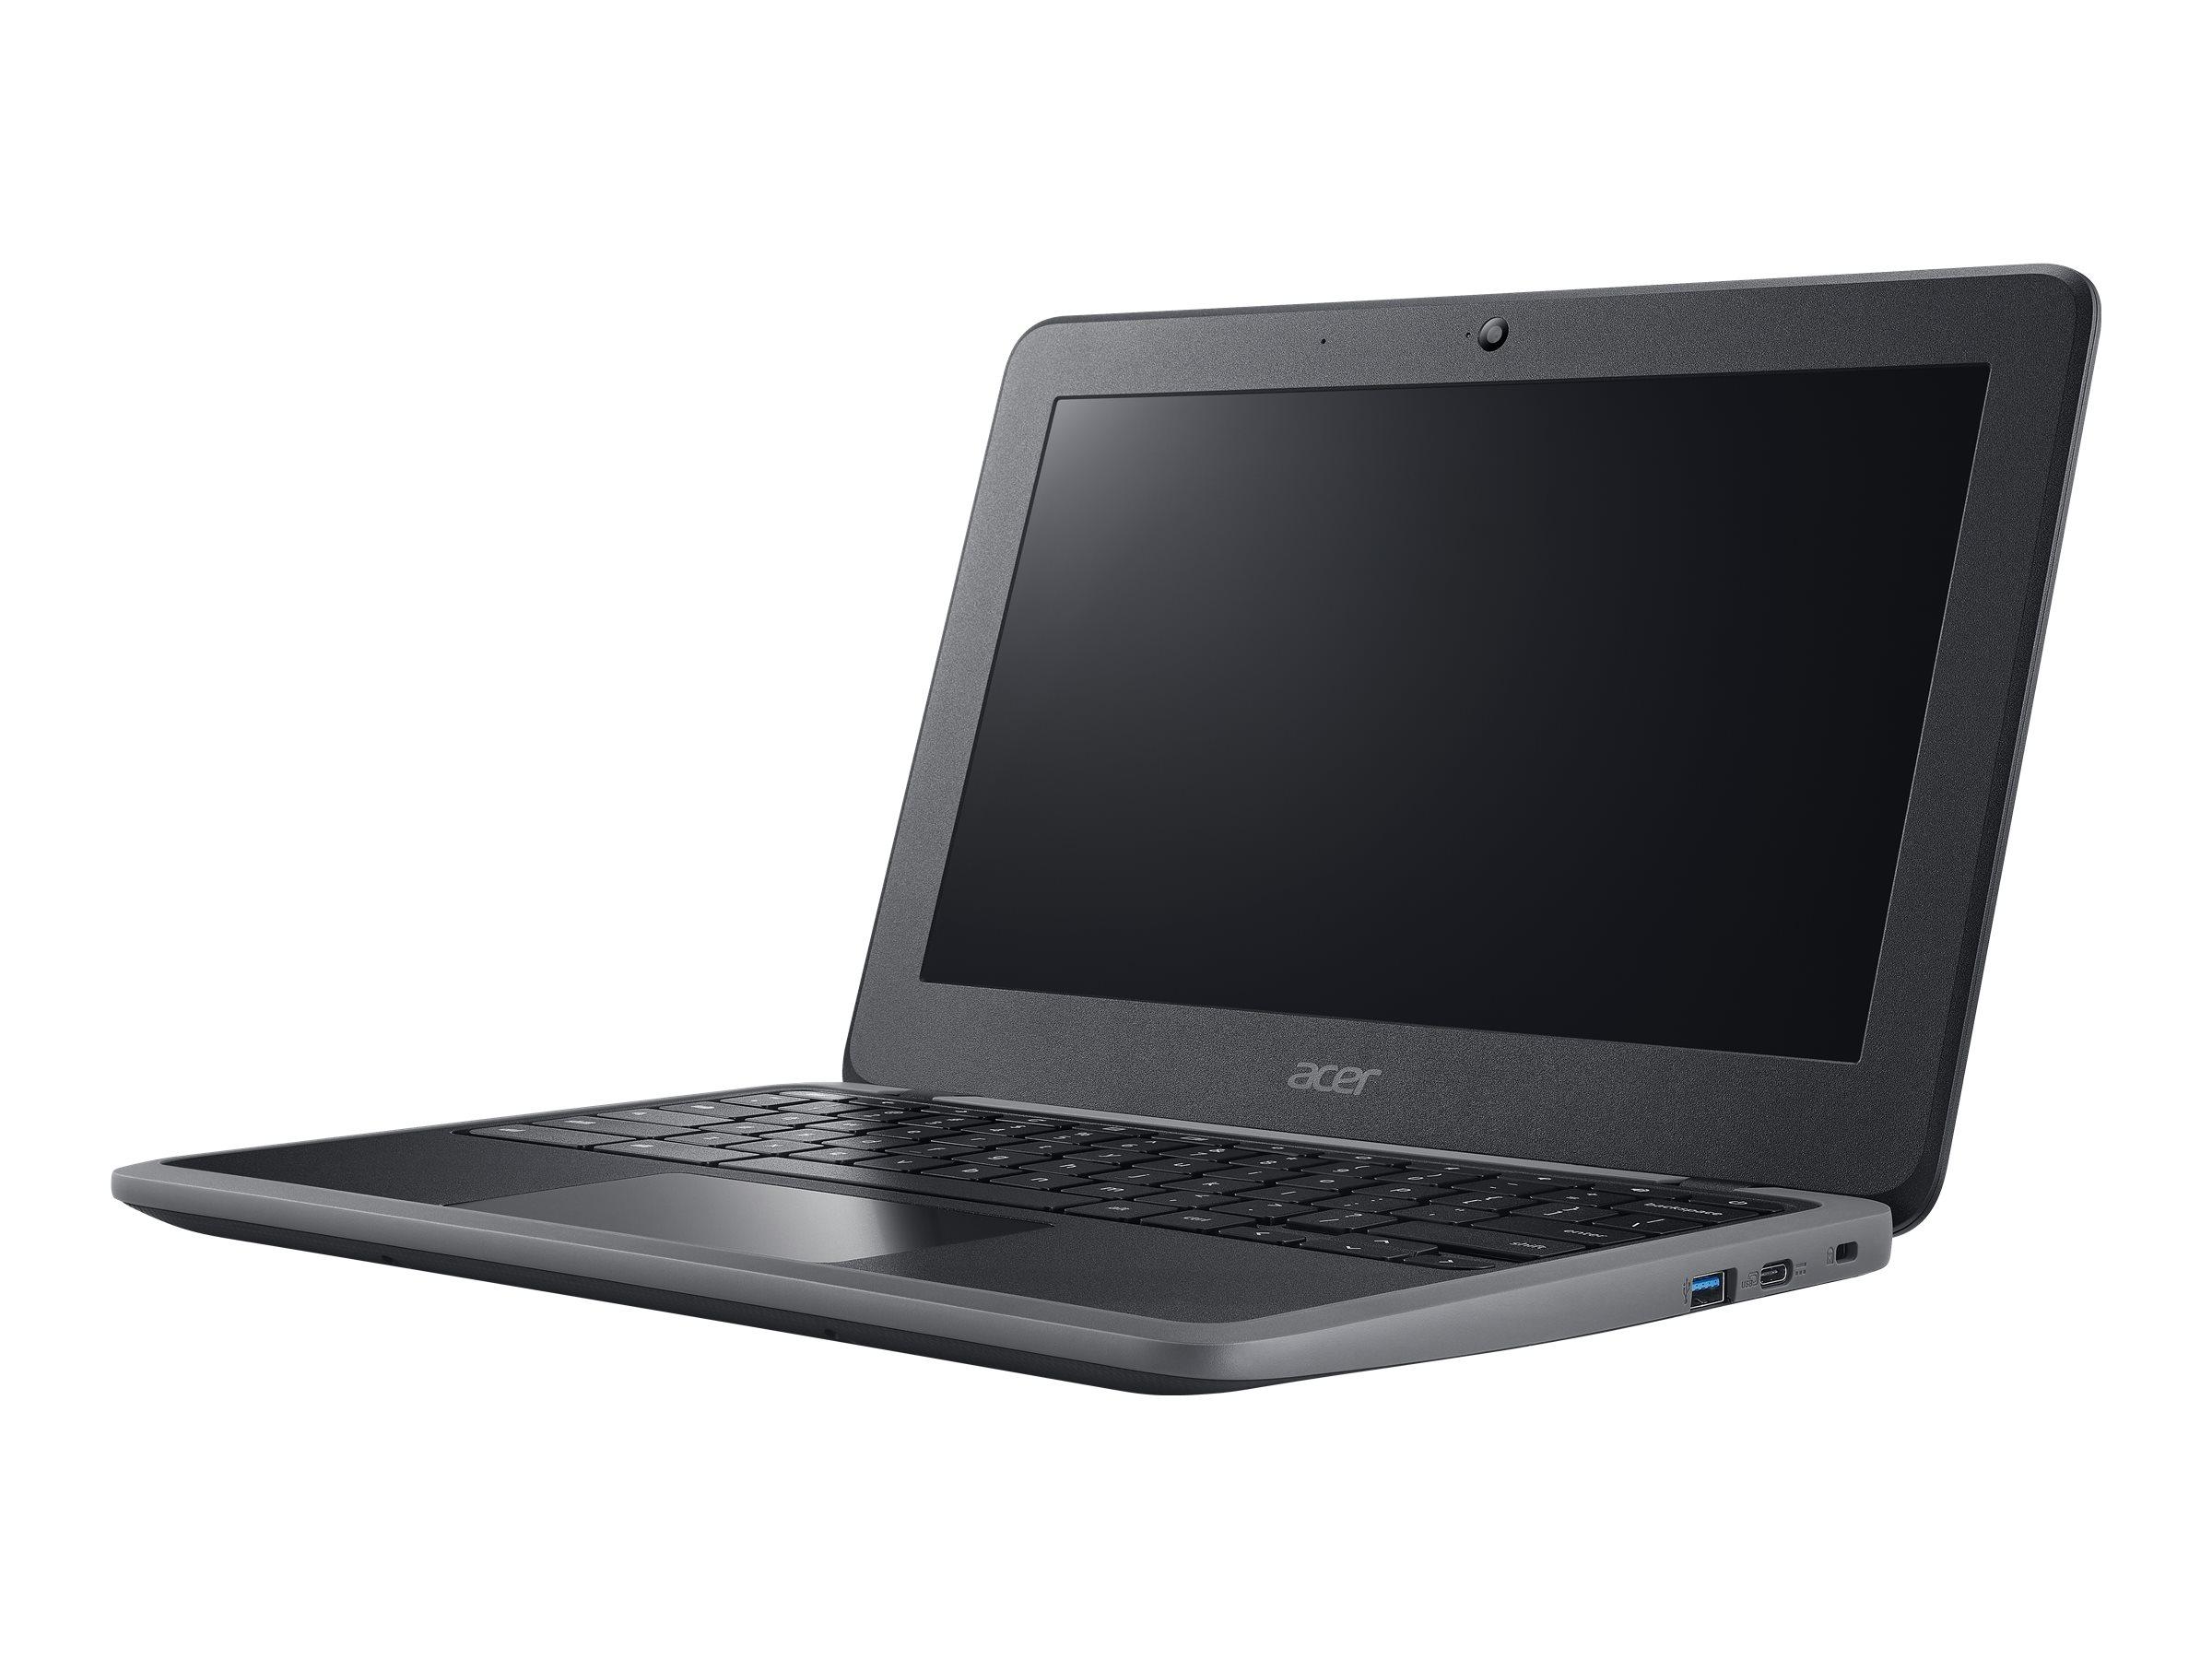 "Acer Chromebook 11 C732LT-C2NH - Celeron N3450 / 1.1 GHz - Chrome OS - 8 GB RAM - 64 GB eMMC - 29.46 cm (11.6"")"